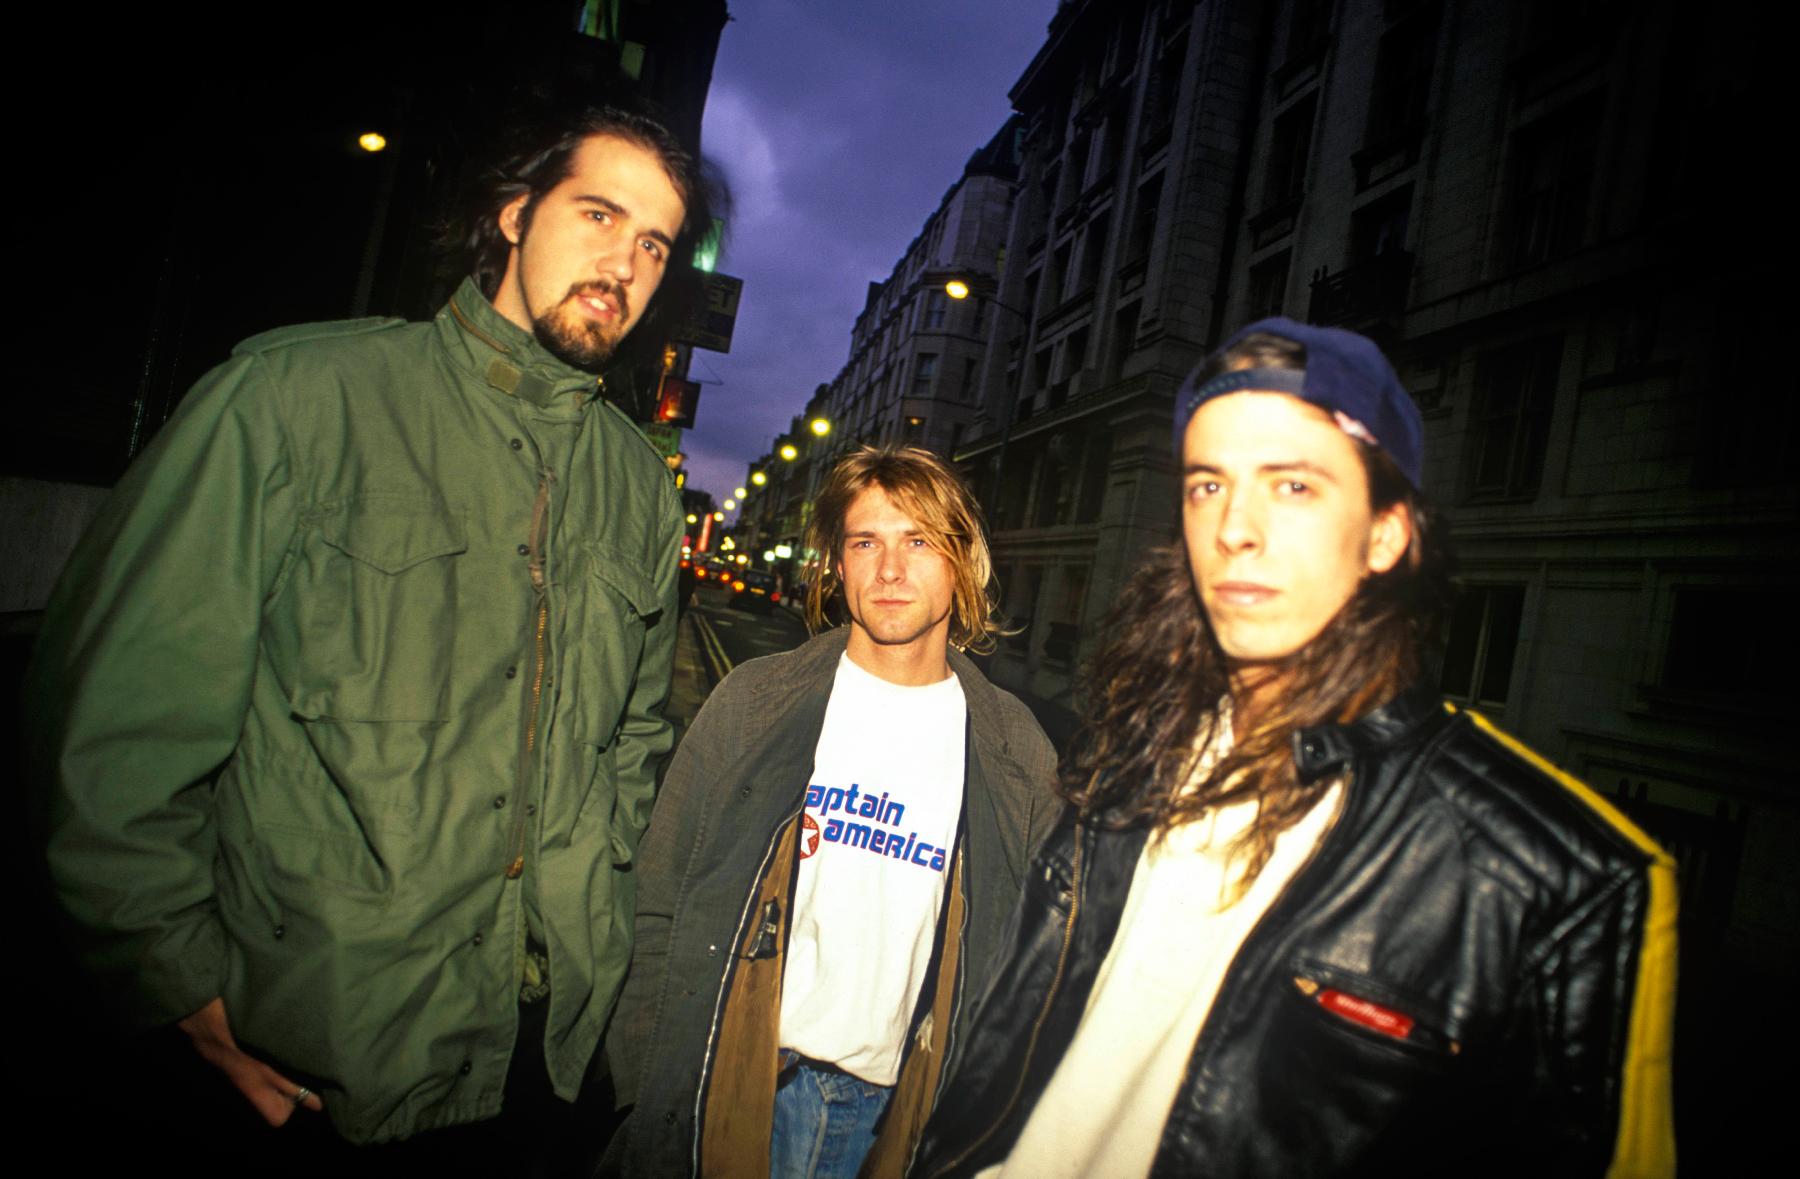 Nirvana Day to Be Celebrated in Hoquiam, Washington